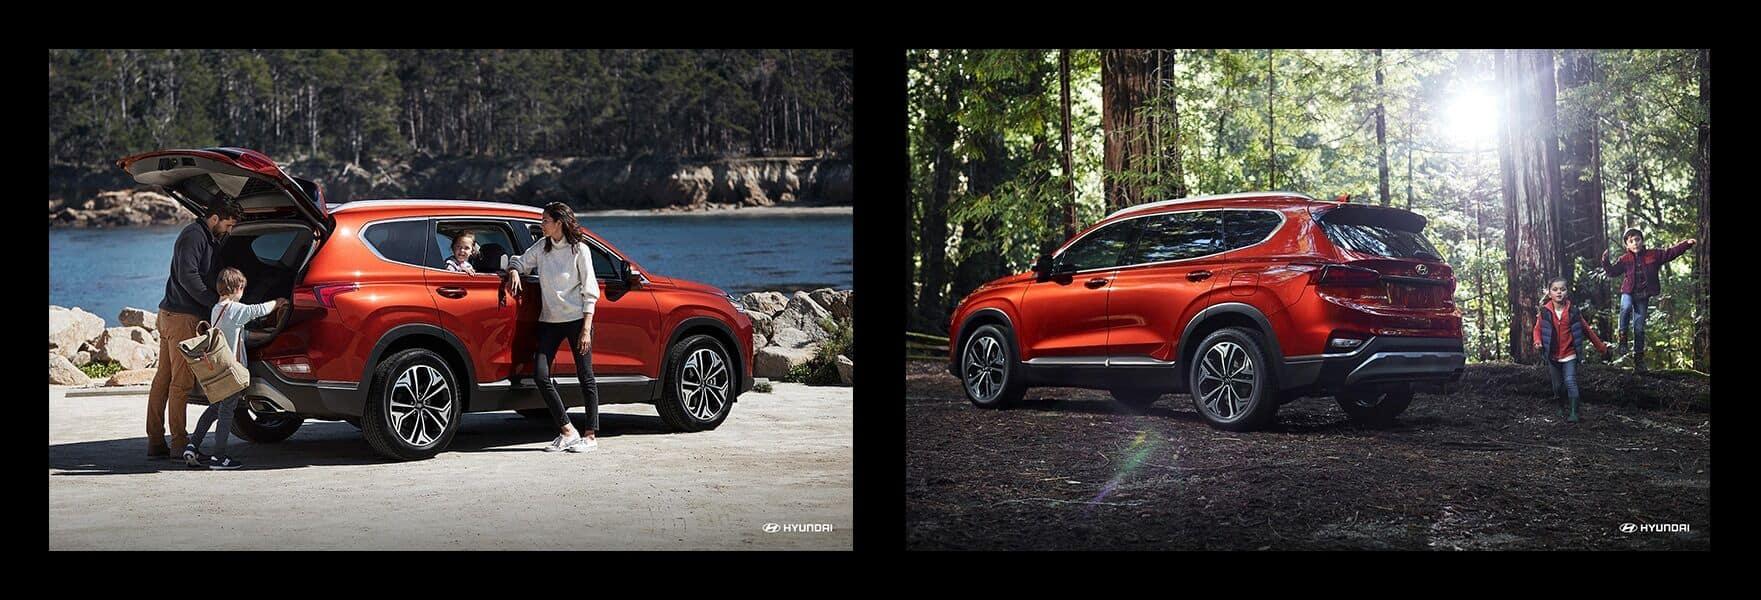 2019 Hyundai Santa Fe Features Chicago